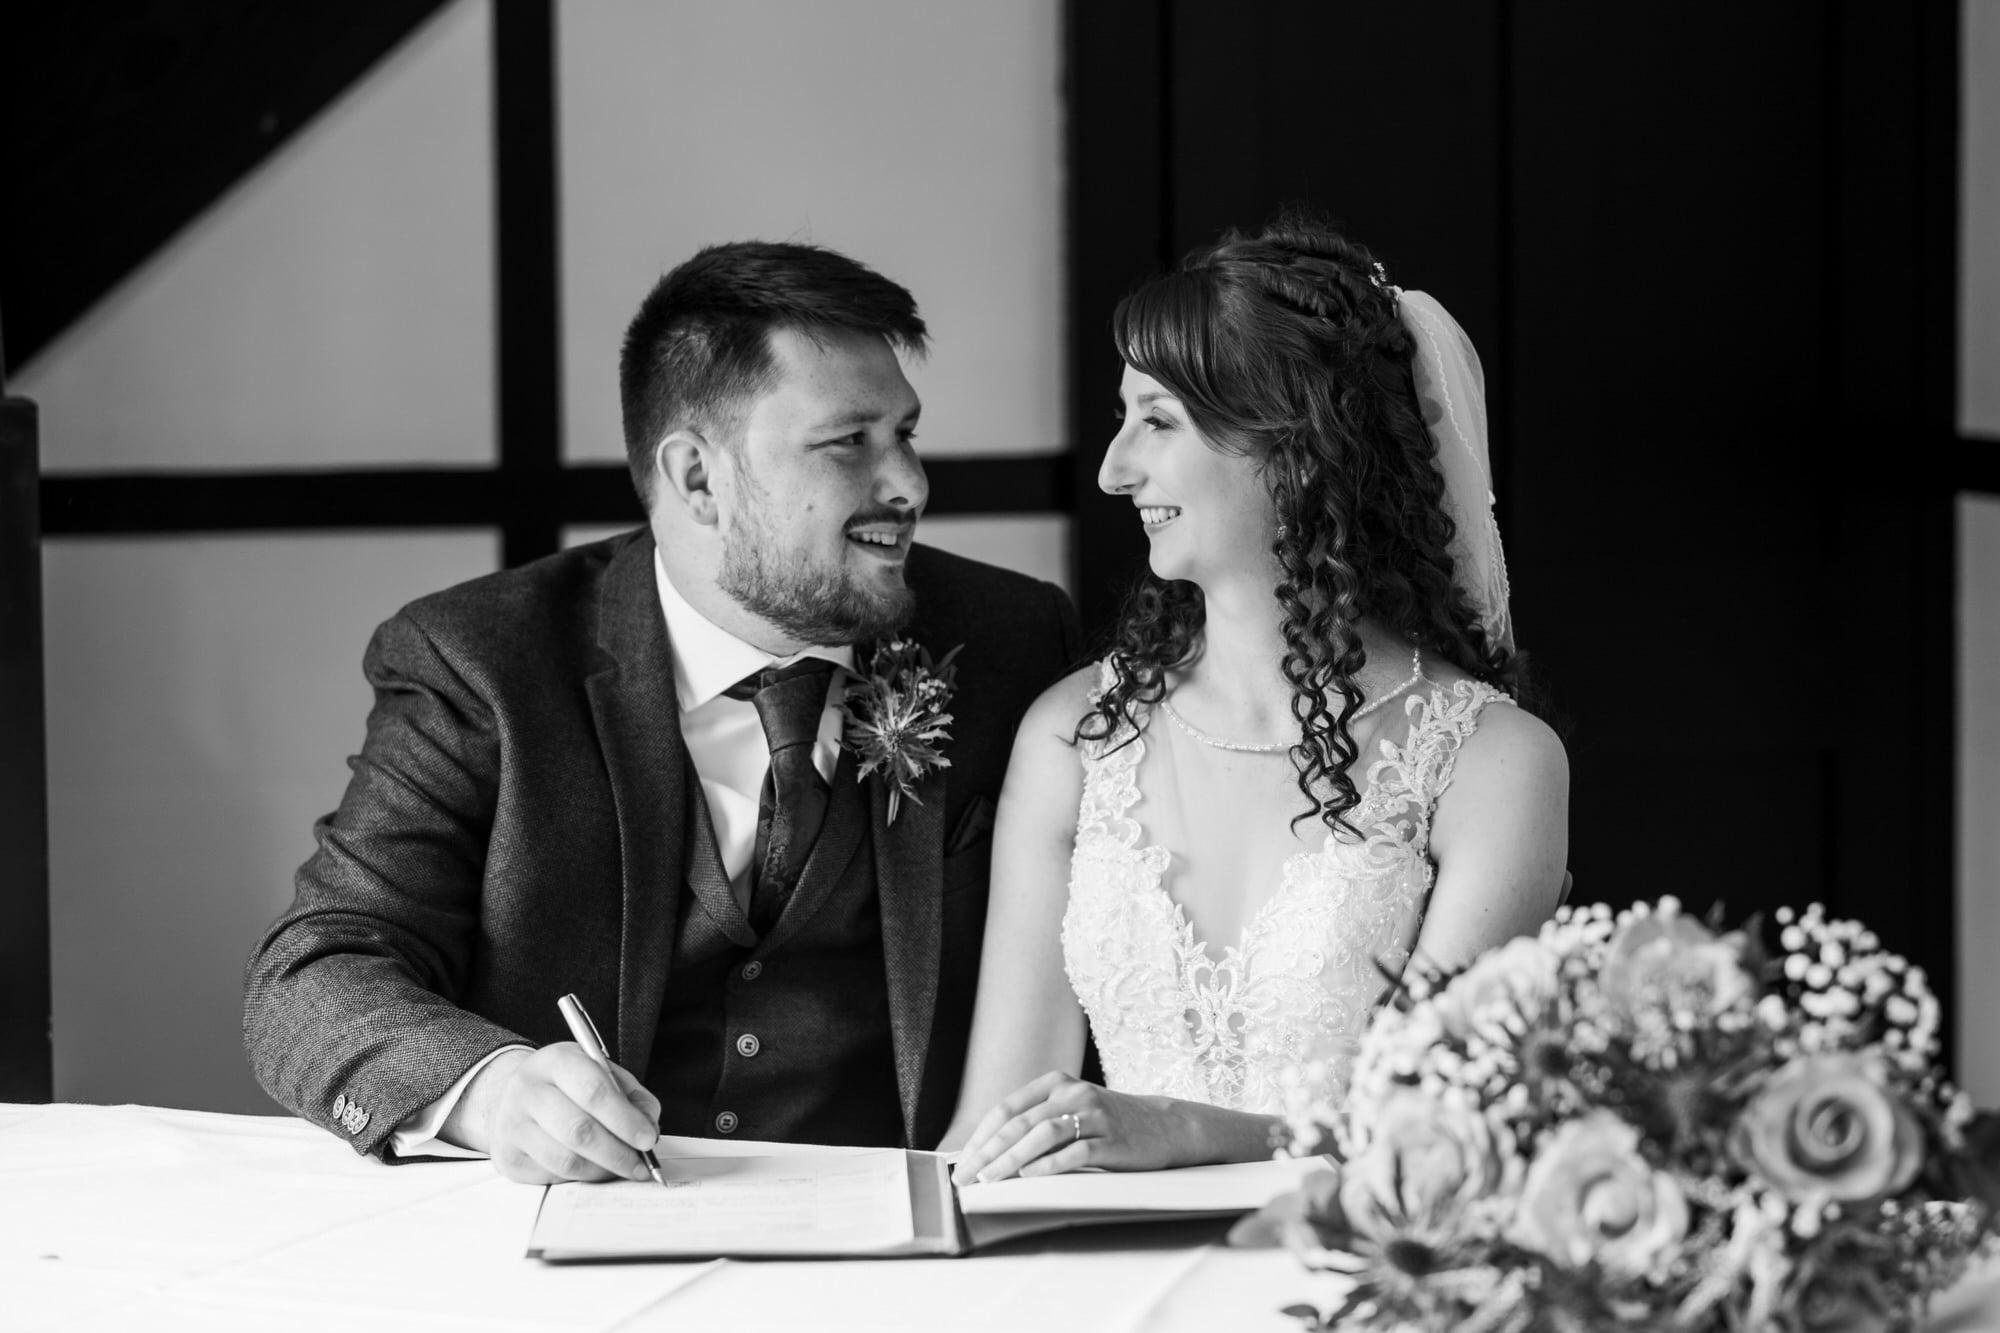 Larmer Tree Wedding ceremonies